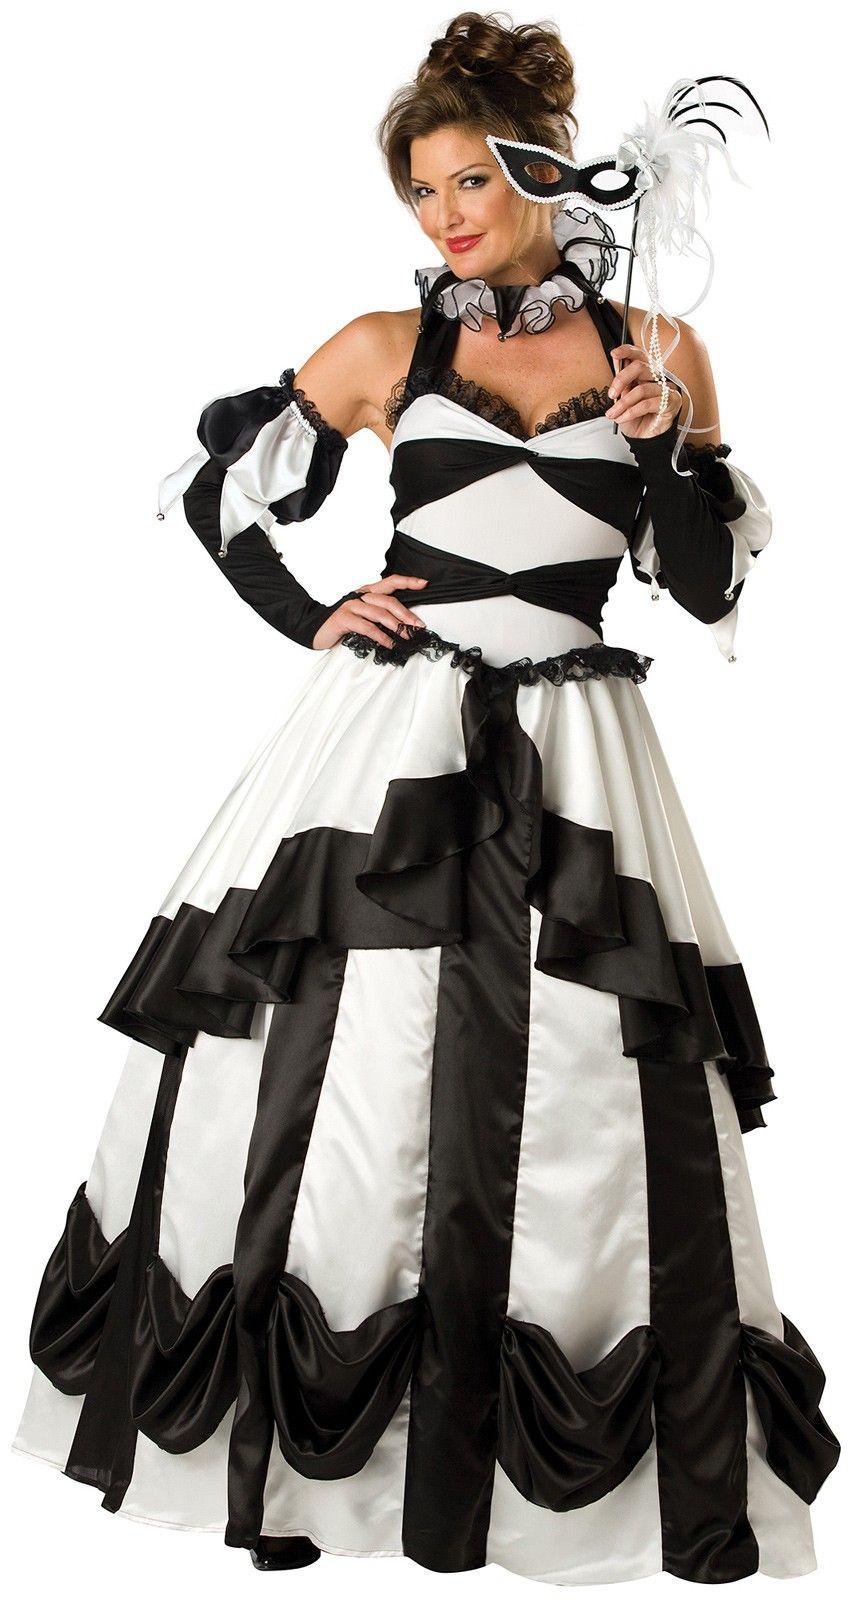 masquerade ball gown #Masquerade #Mask #Gown   Party ideas ...